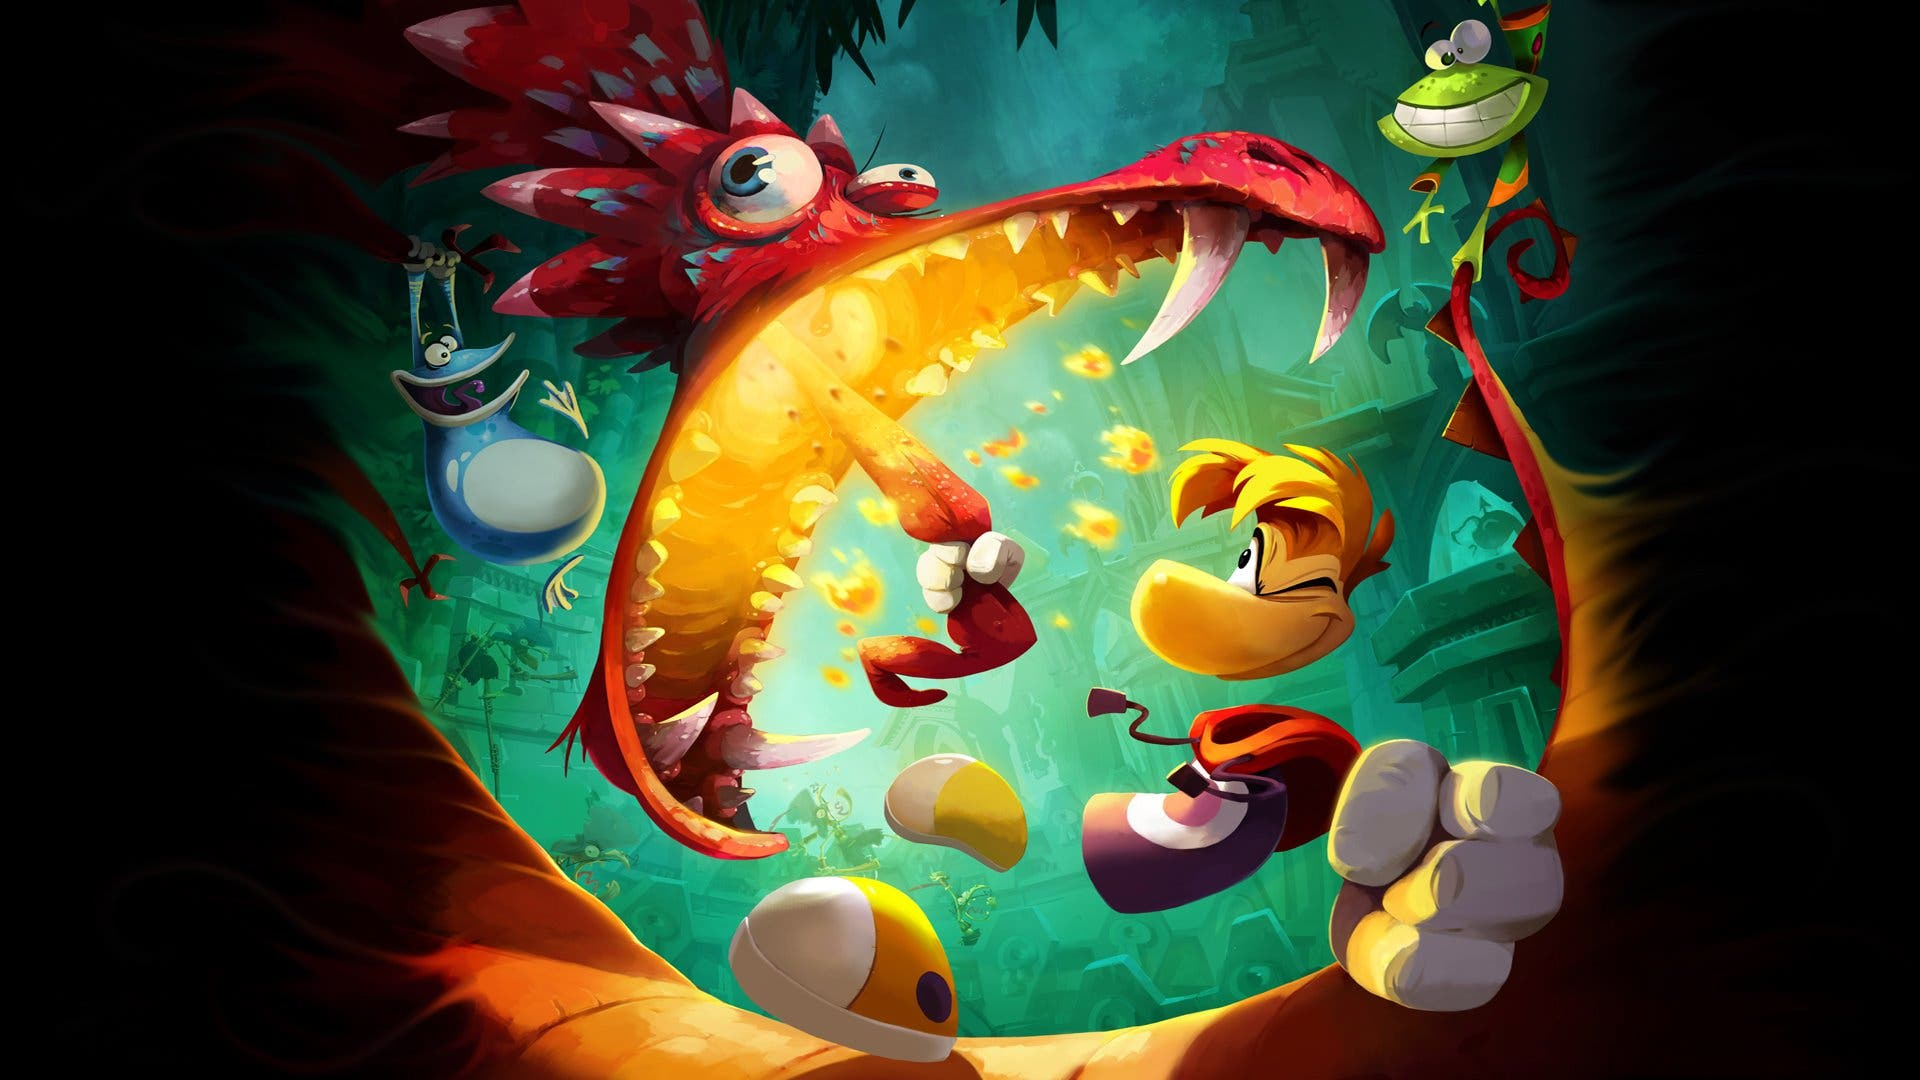 Michel Ancel quiere traer de vuelta a Rayman 9